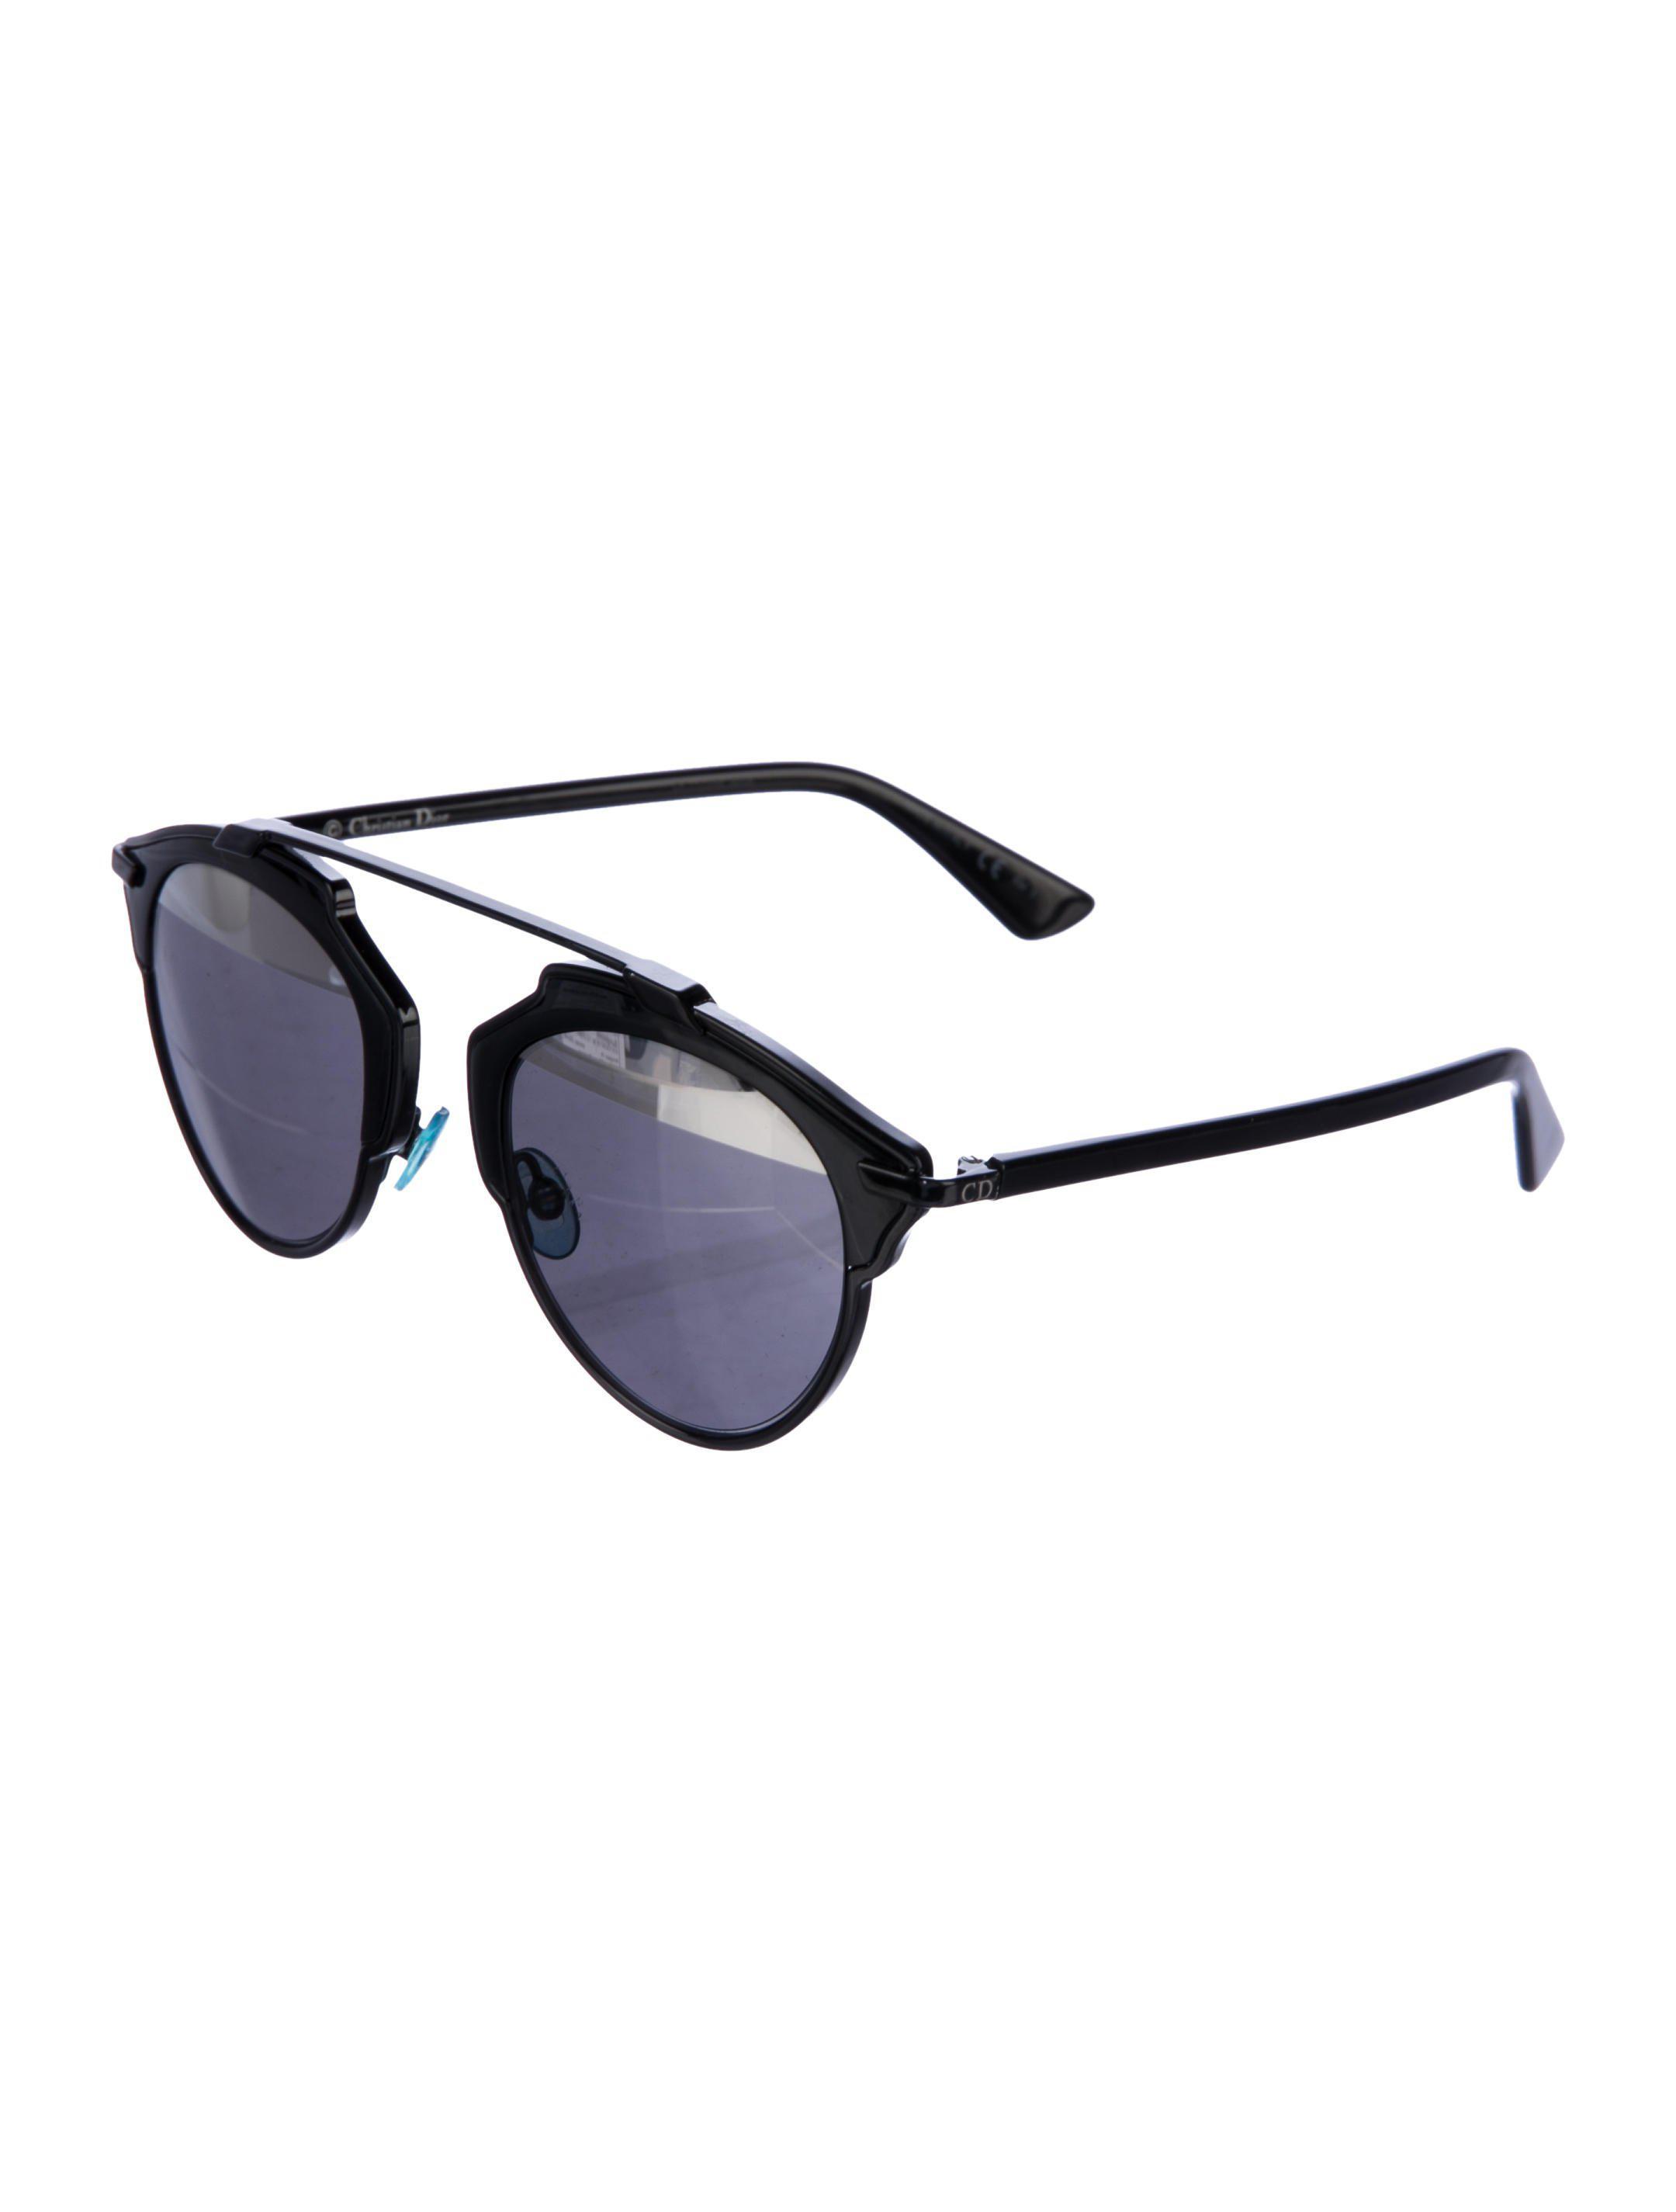 128c74147ae6 Lyst - Dior So Real Split Sunglasses Black in Metallic